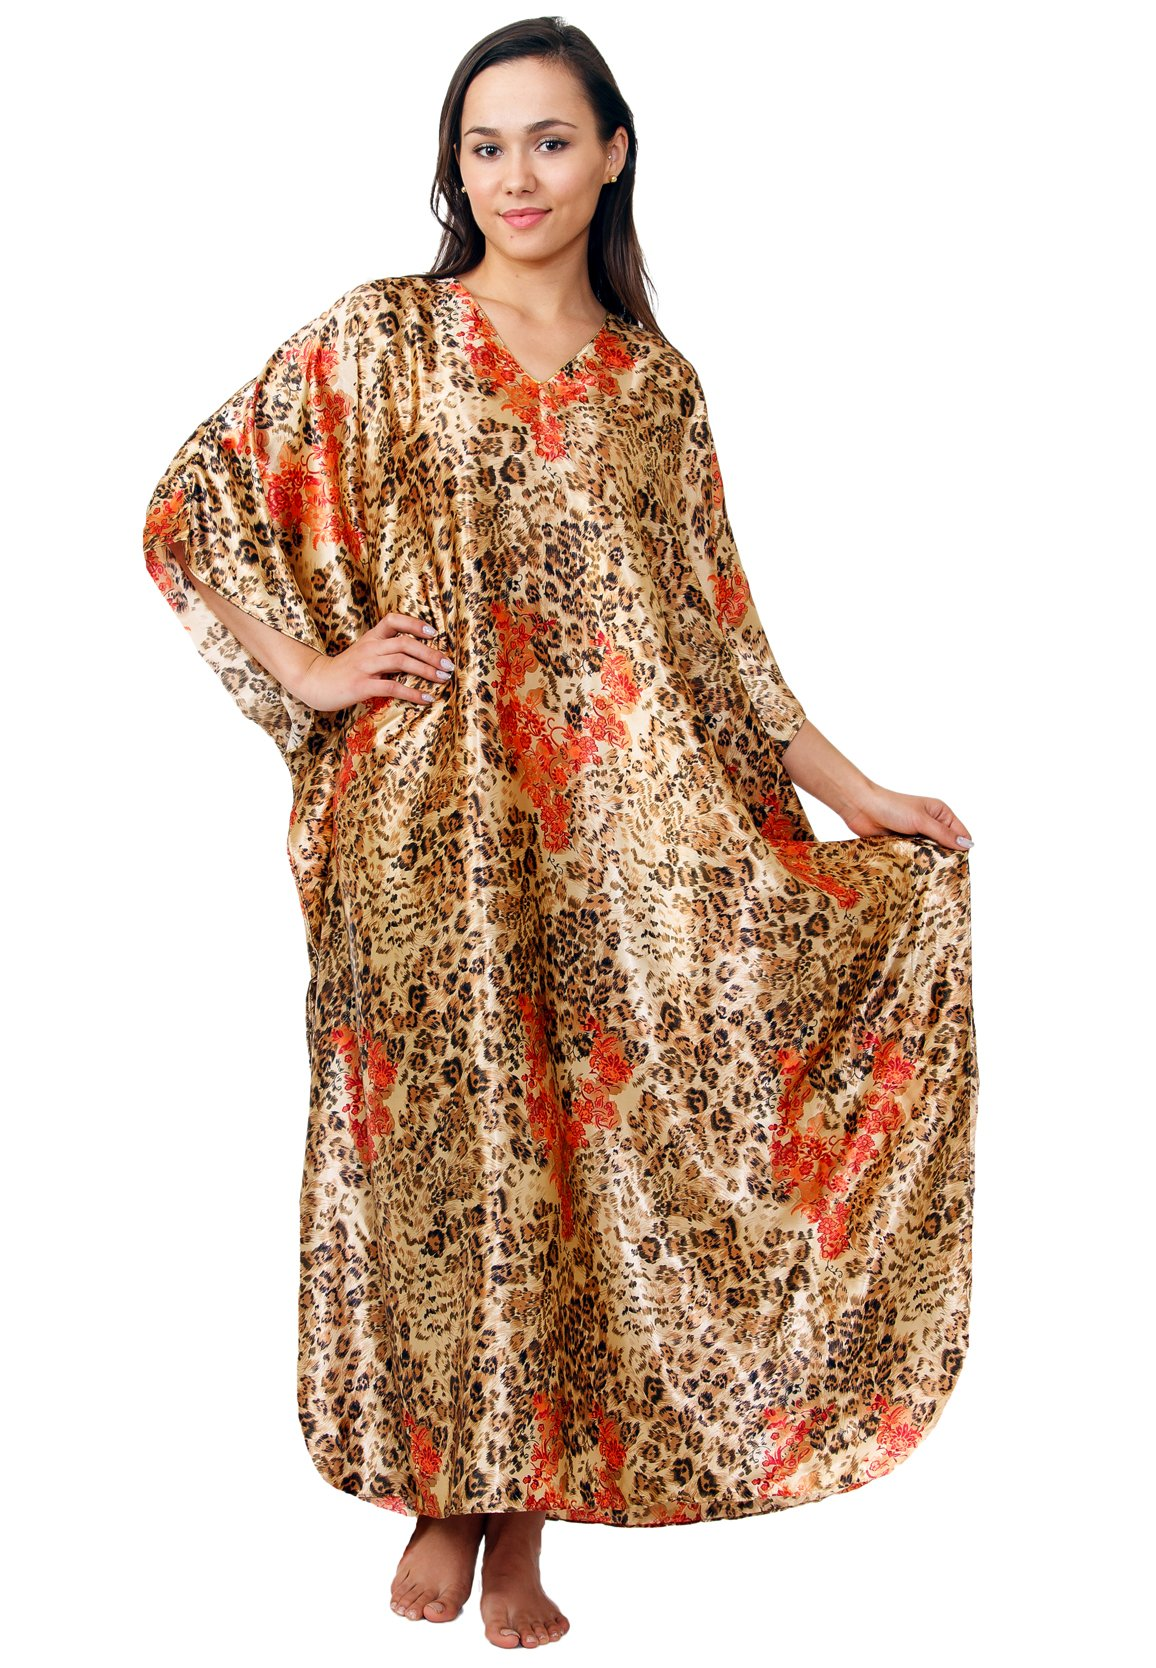 Satin Caftan, Exellent Cheetah Print, Plus Size, Style#Caf-45